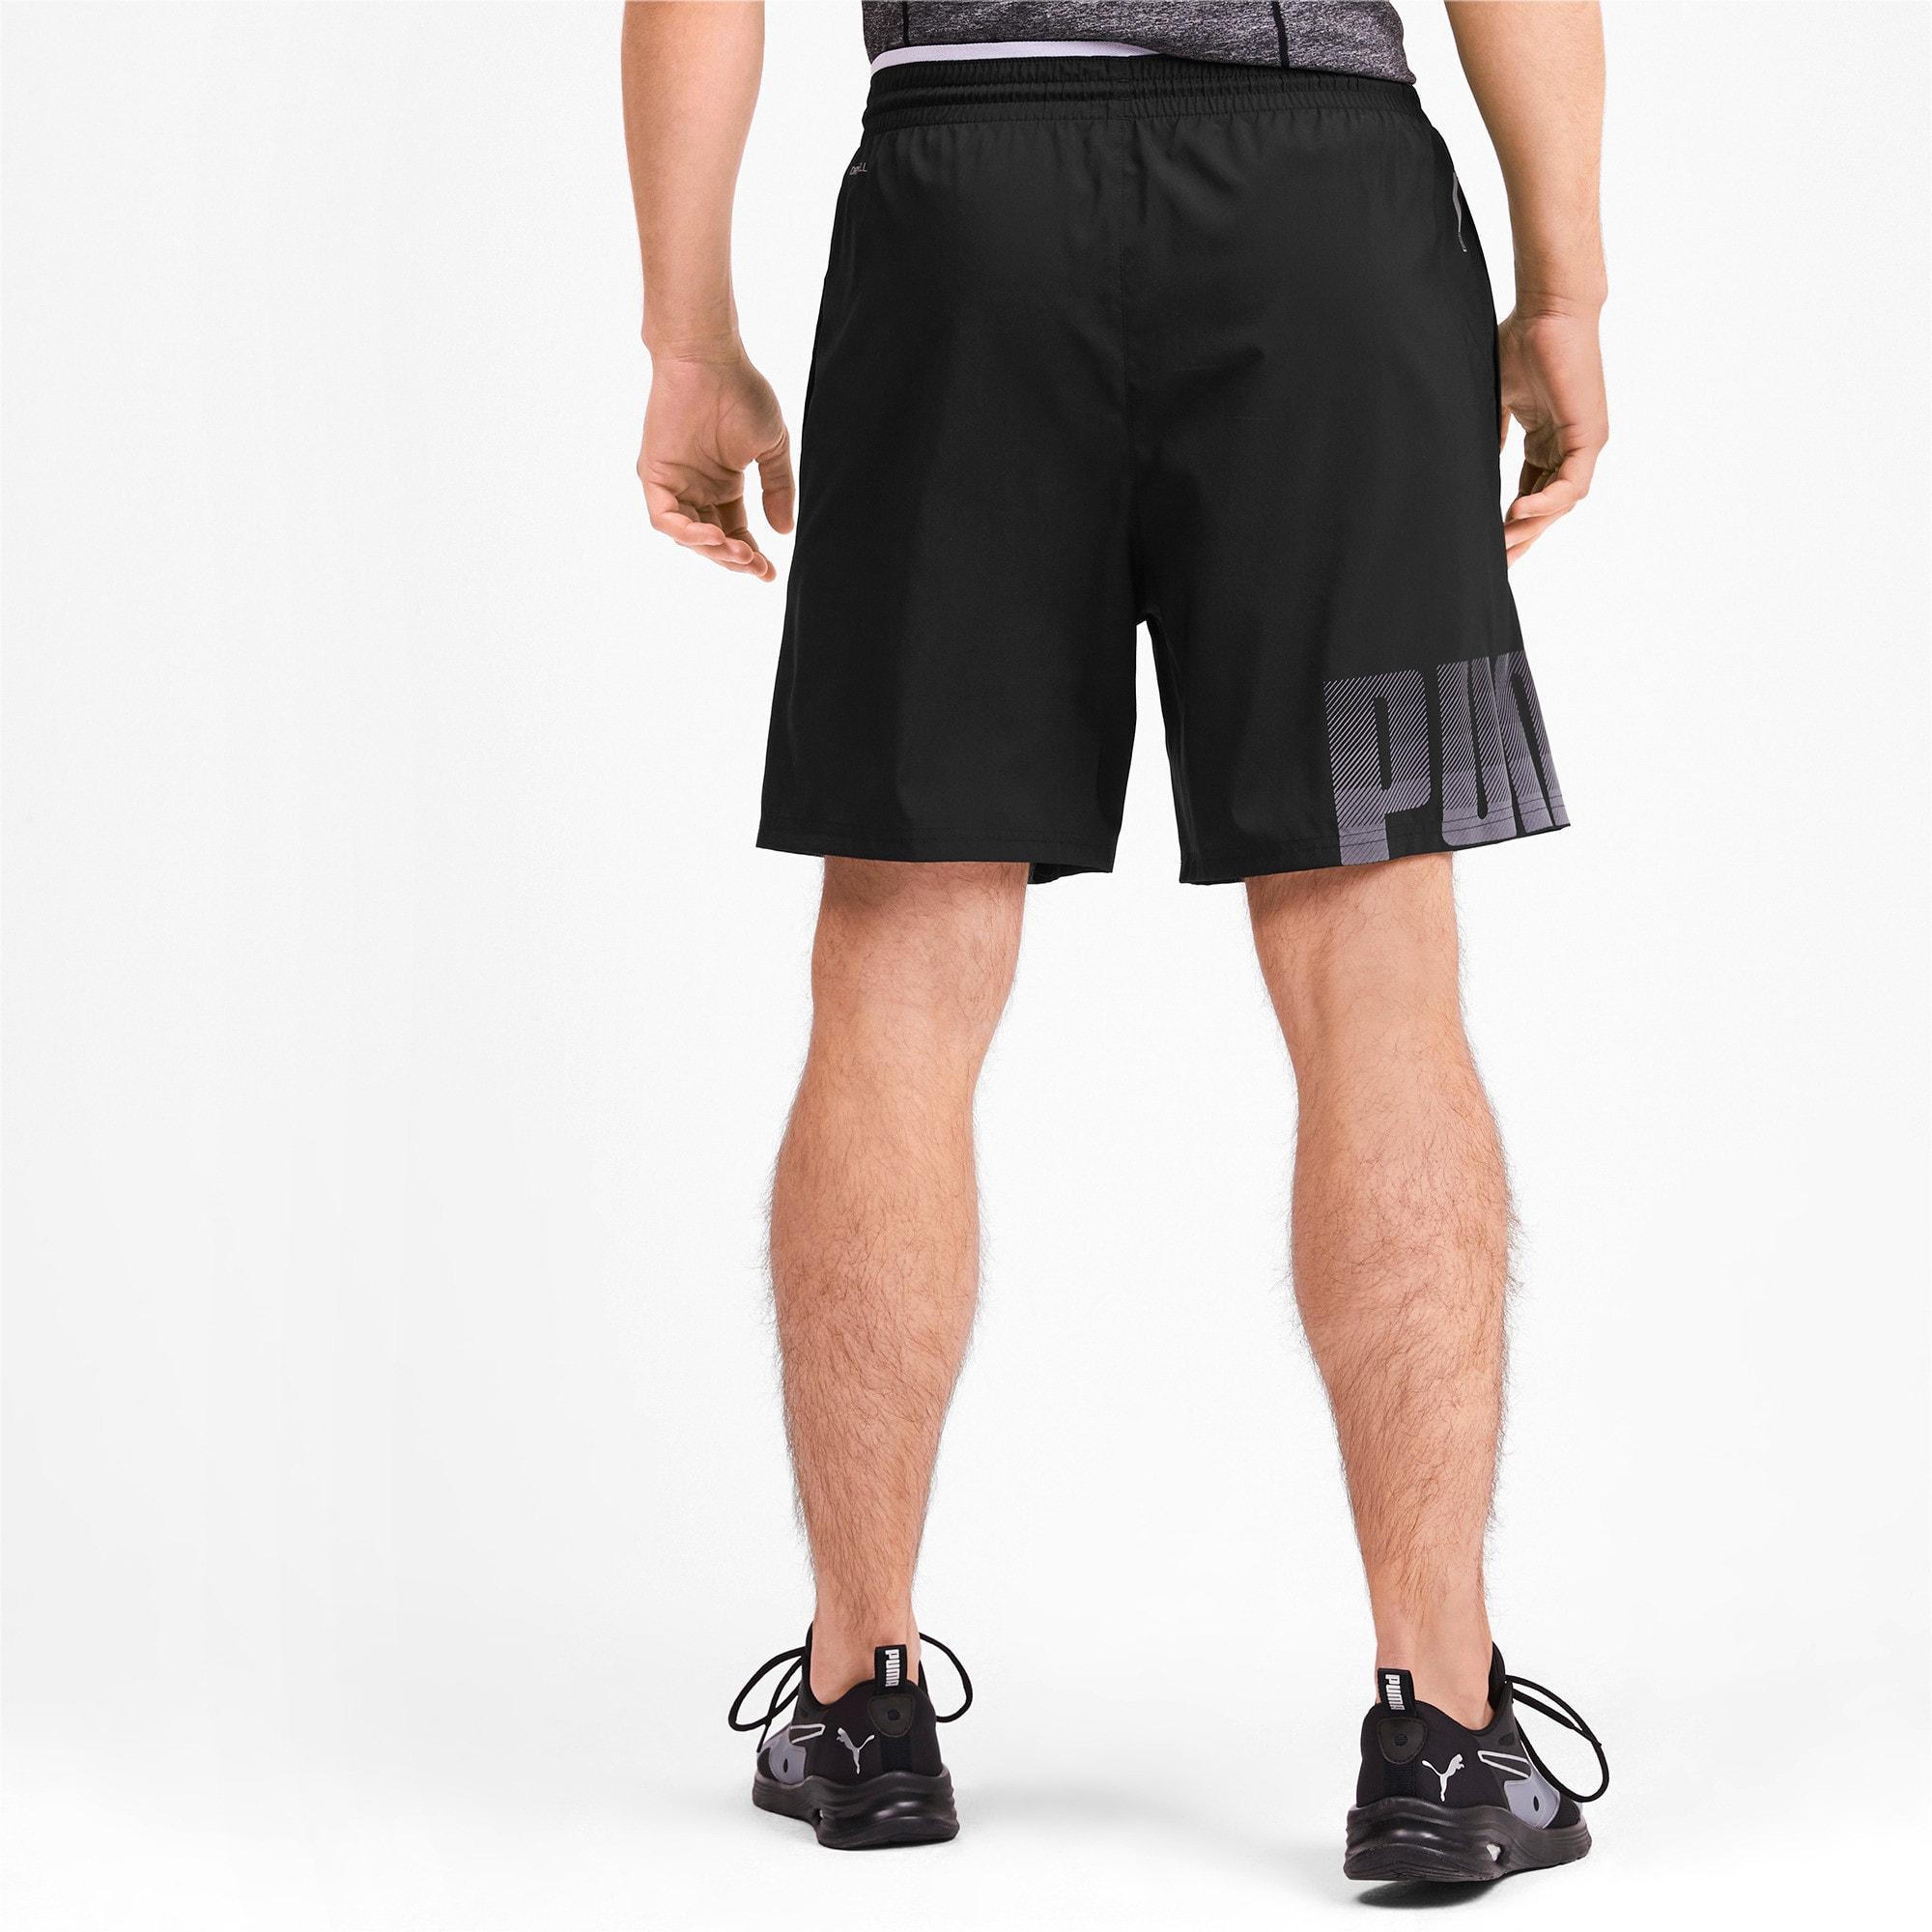 Thumbnail 2 of Collective Woven Men's Training Shorts, Puma Black, medium